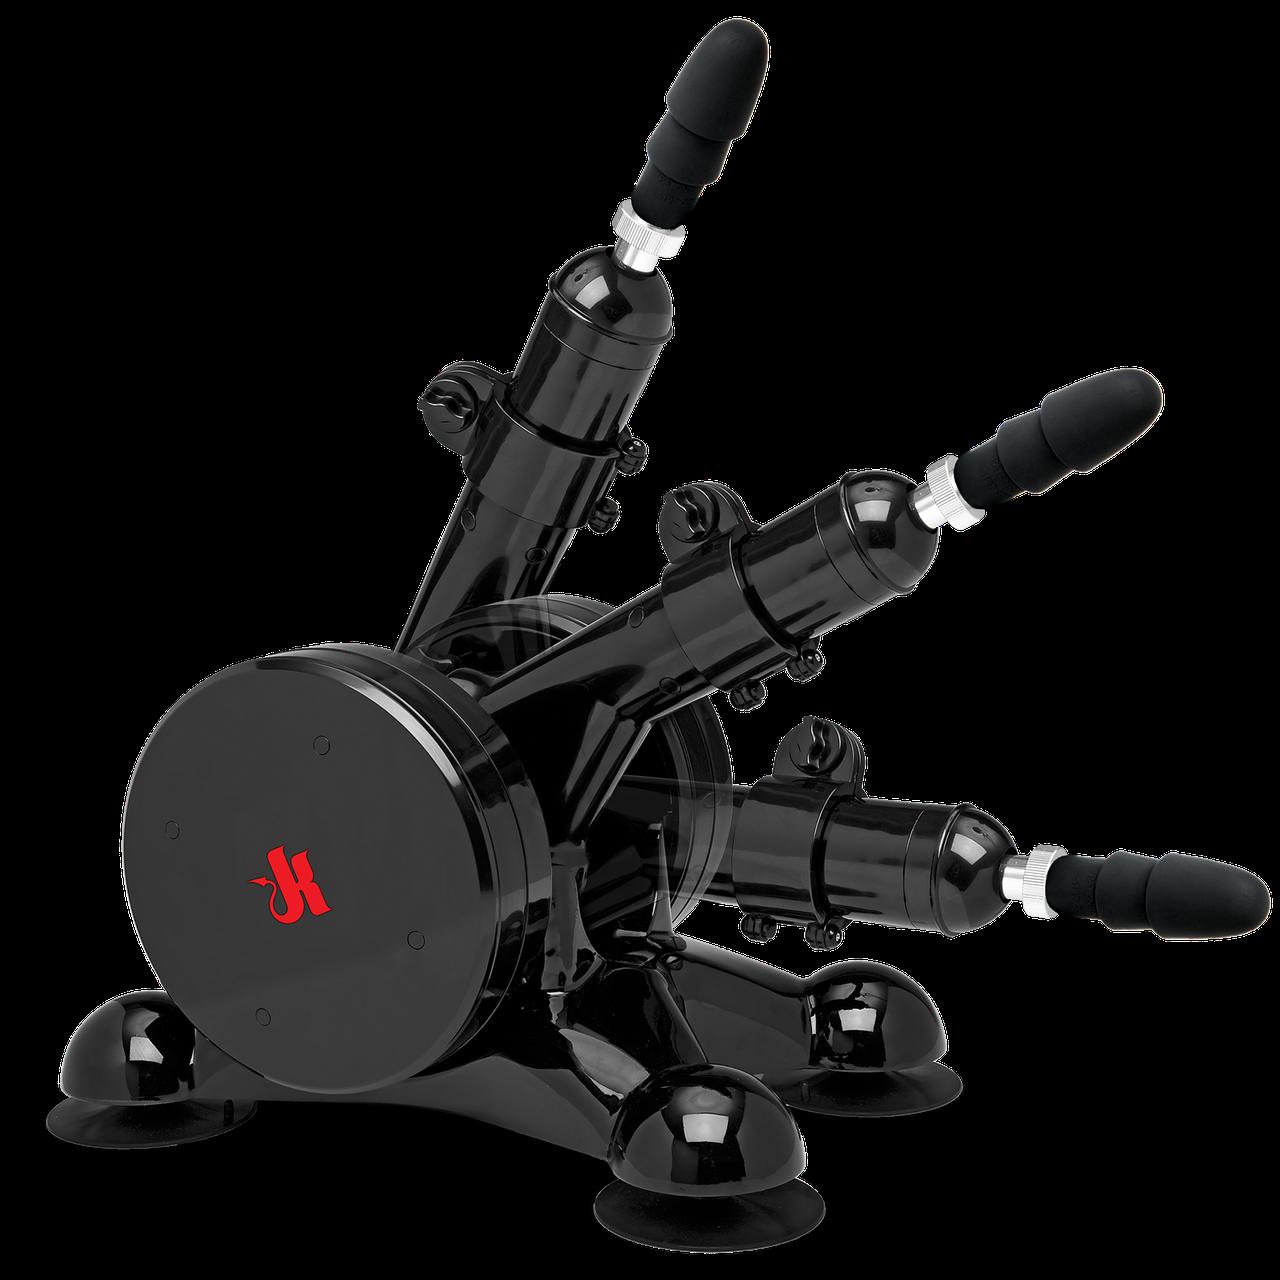 Секс машина Doc Johnson Kink - Fucking Machines Power Banger с креплением Vac-U-Lock SO1583 код